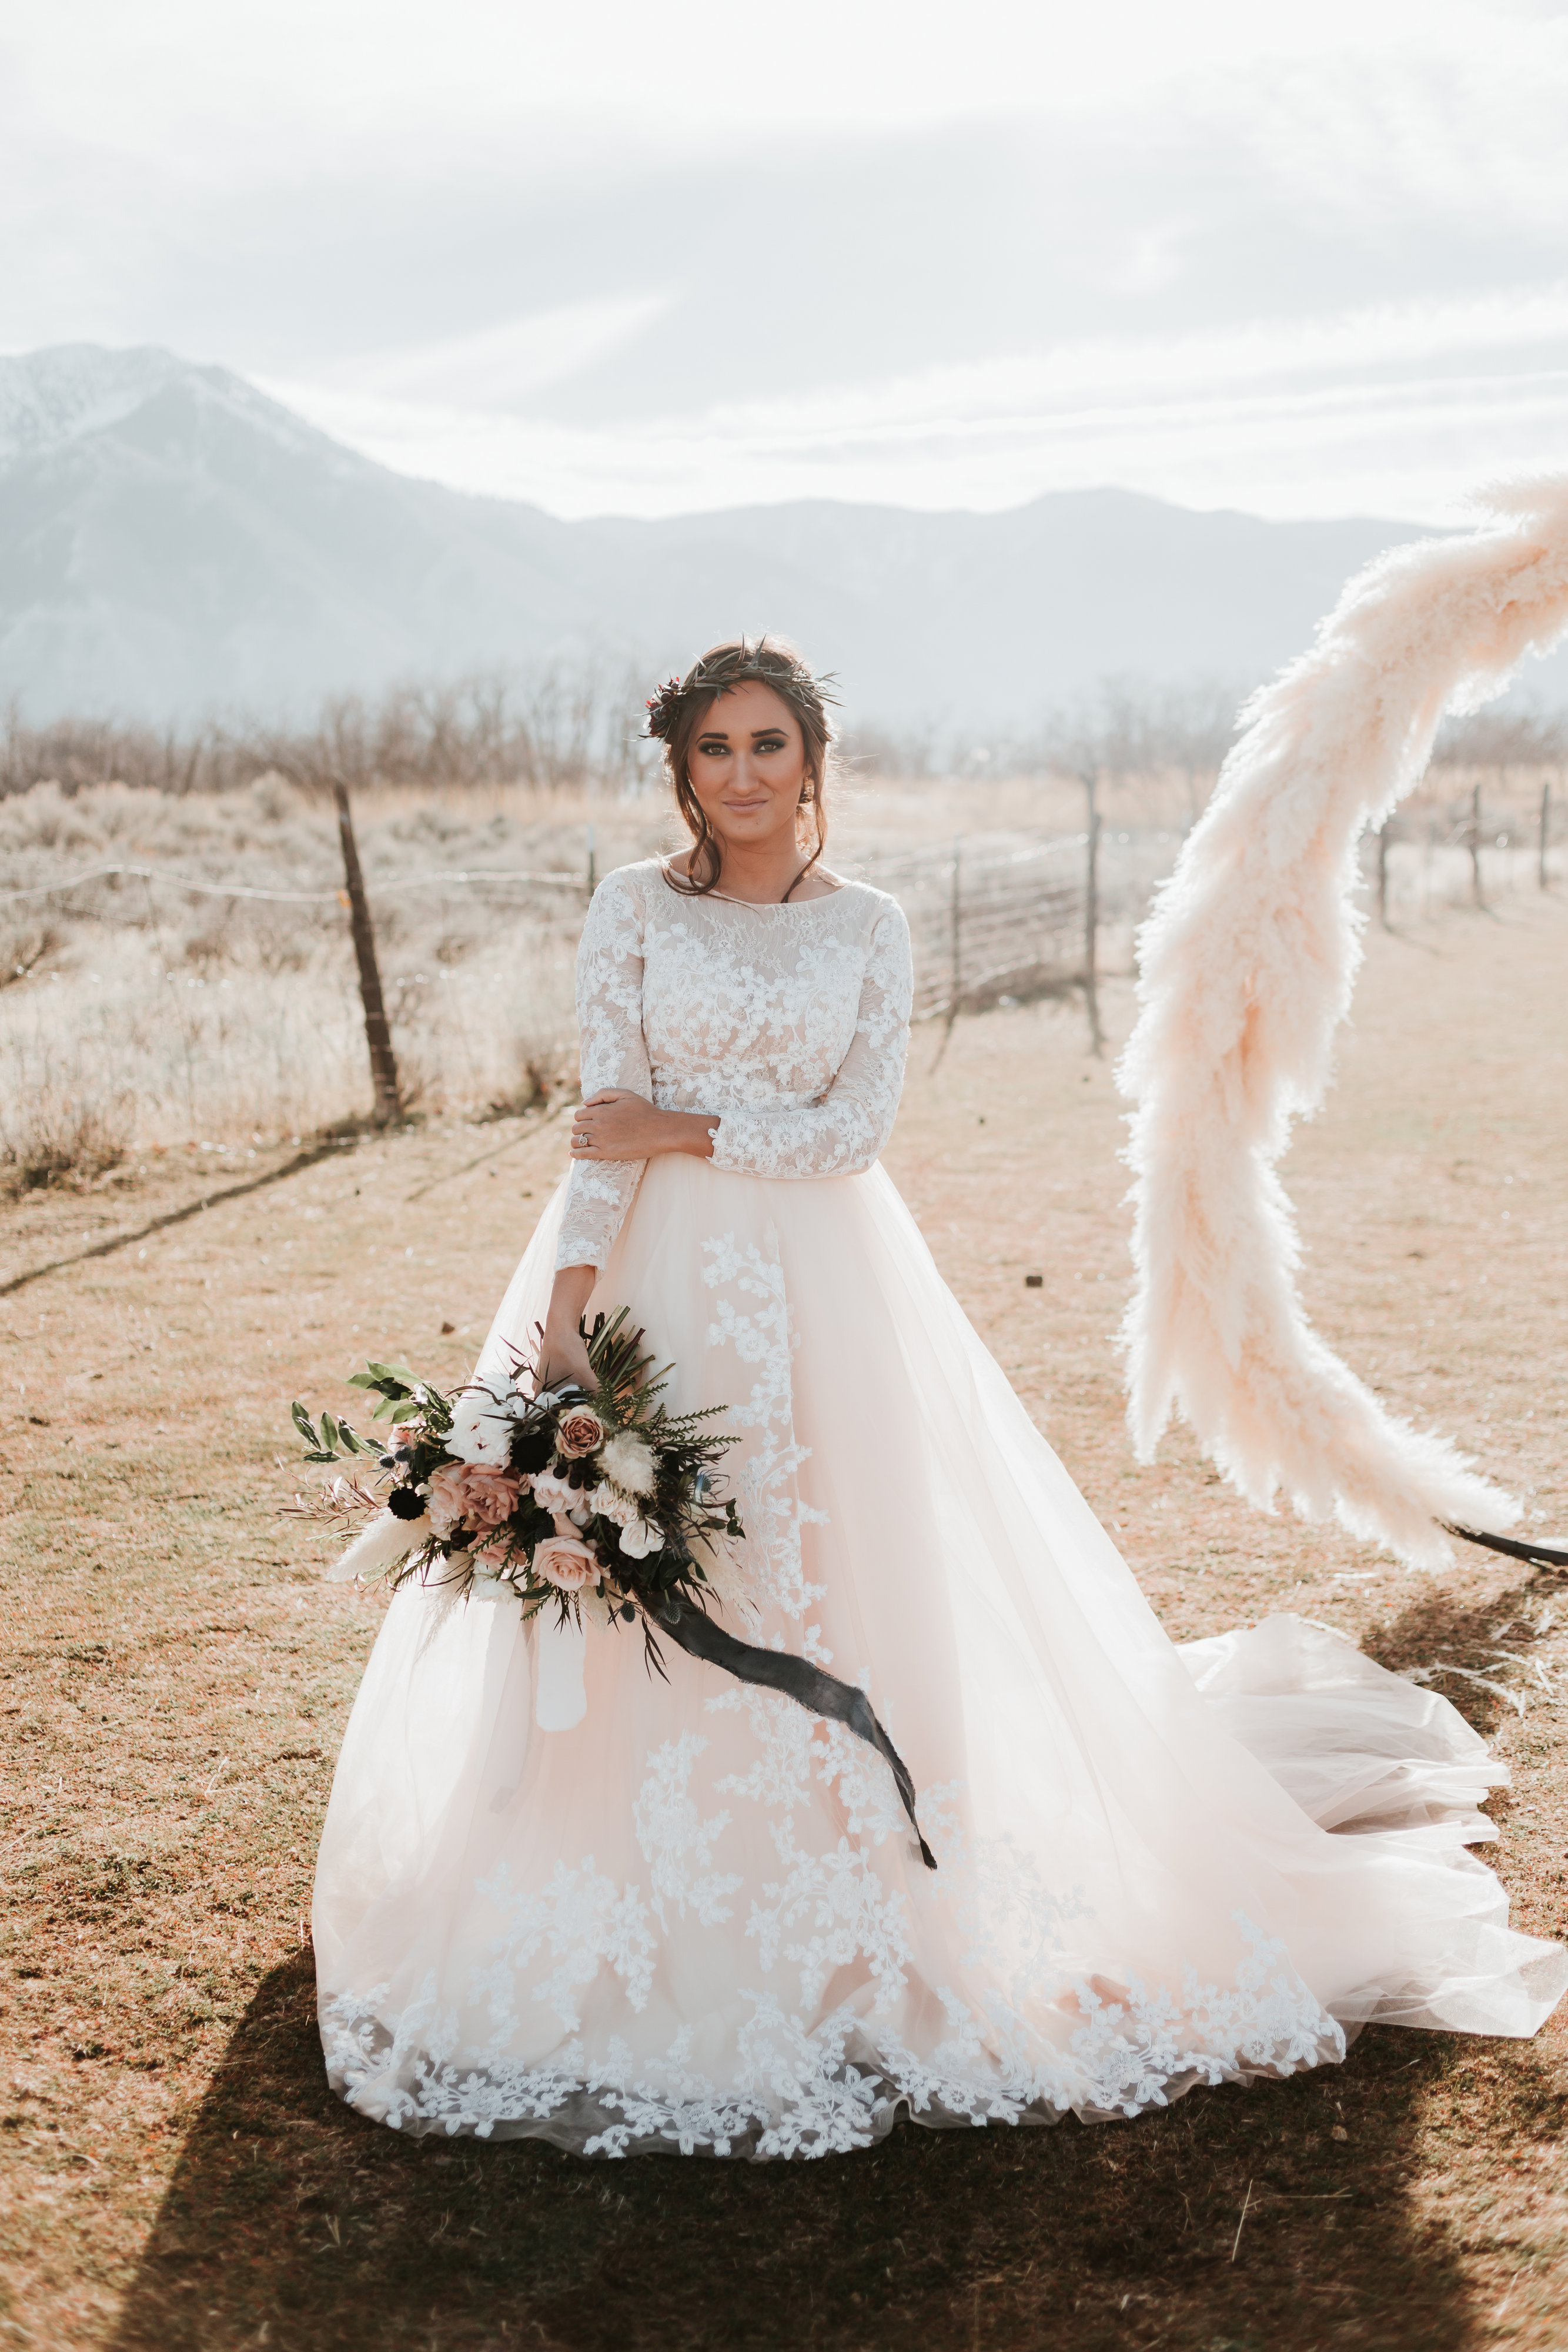 Wedding Dress Rentals Something Borrowed Bridal Rentals Utah